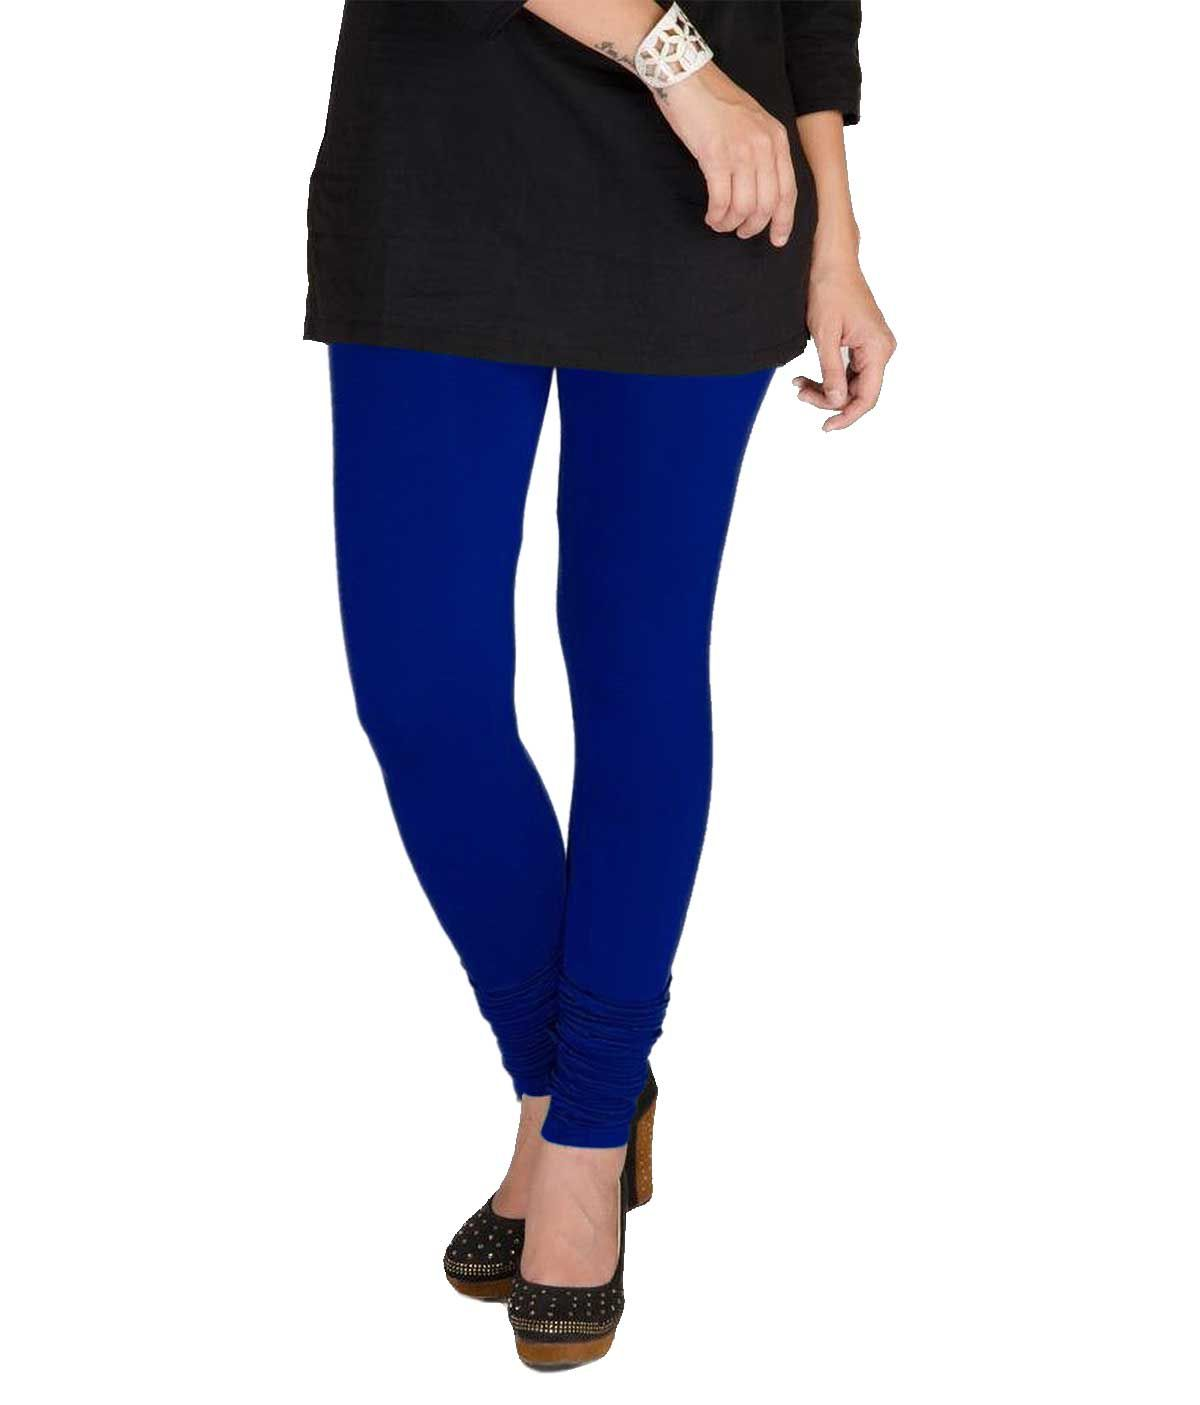 TBZ Cotton Lycra Single Leggings